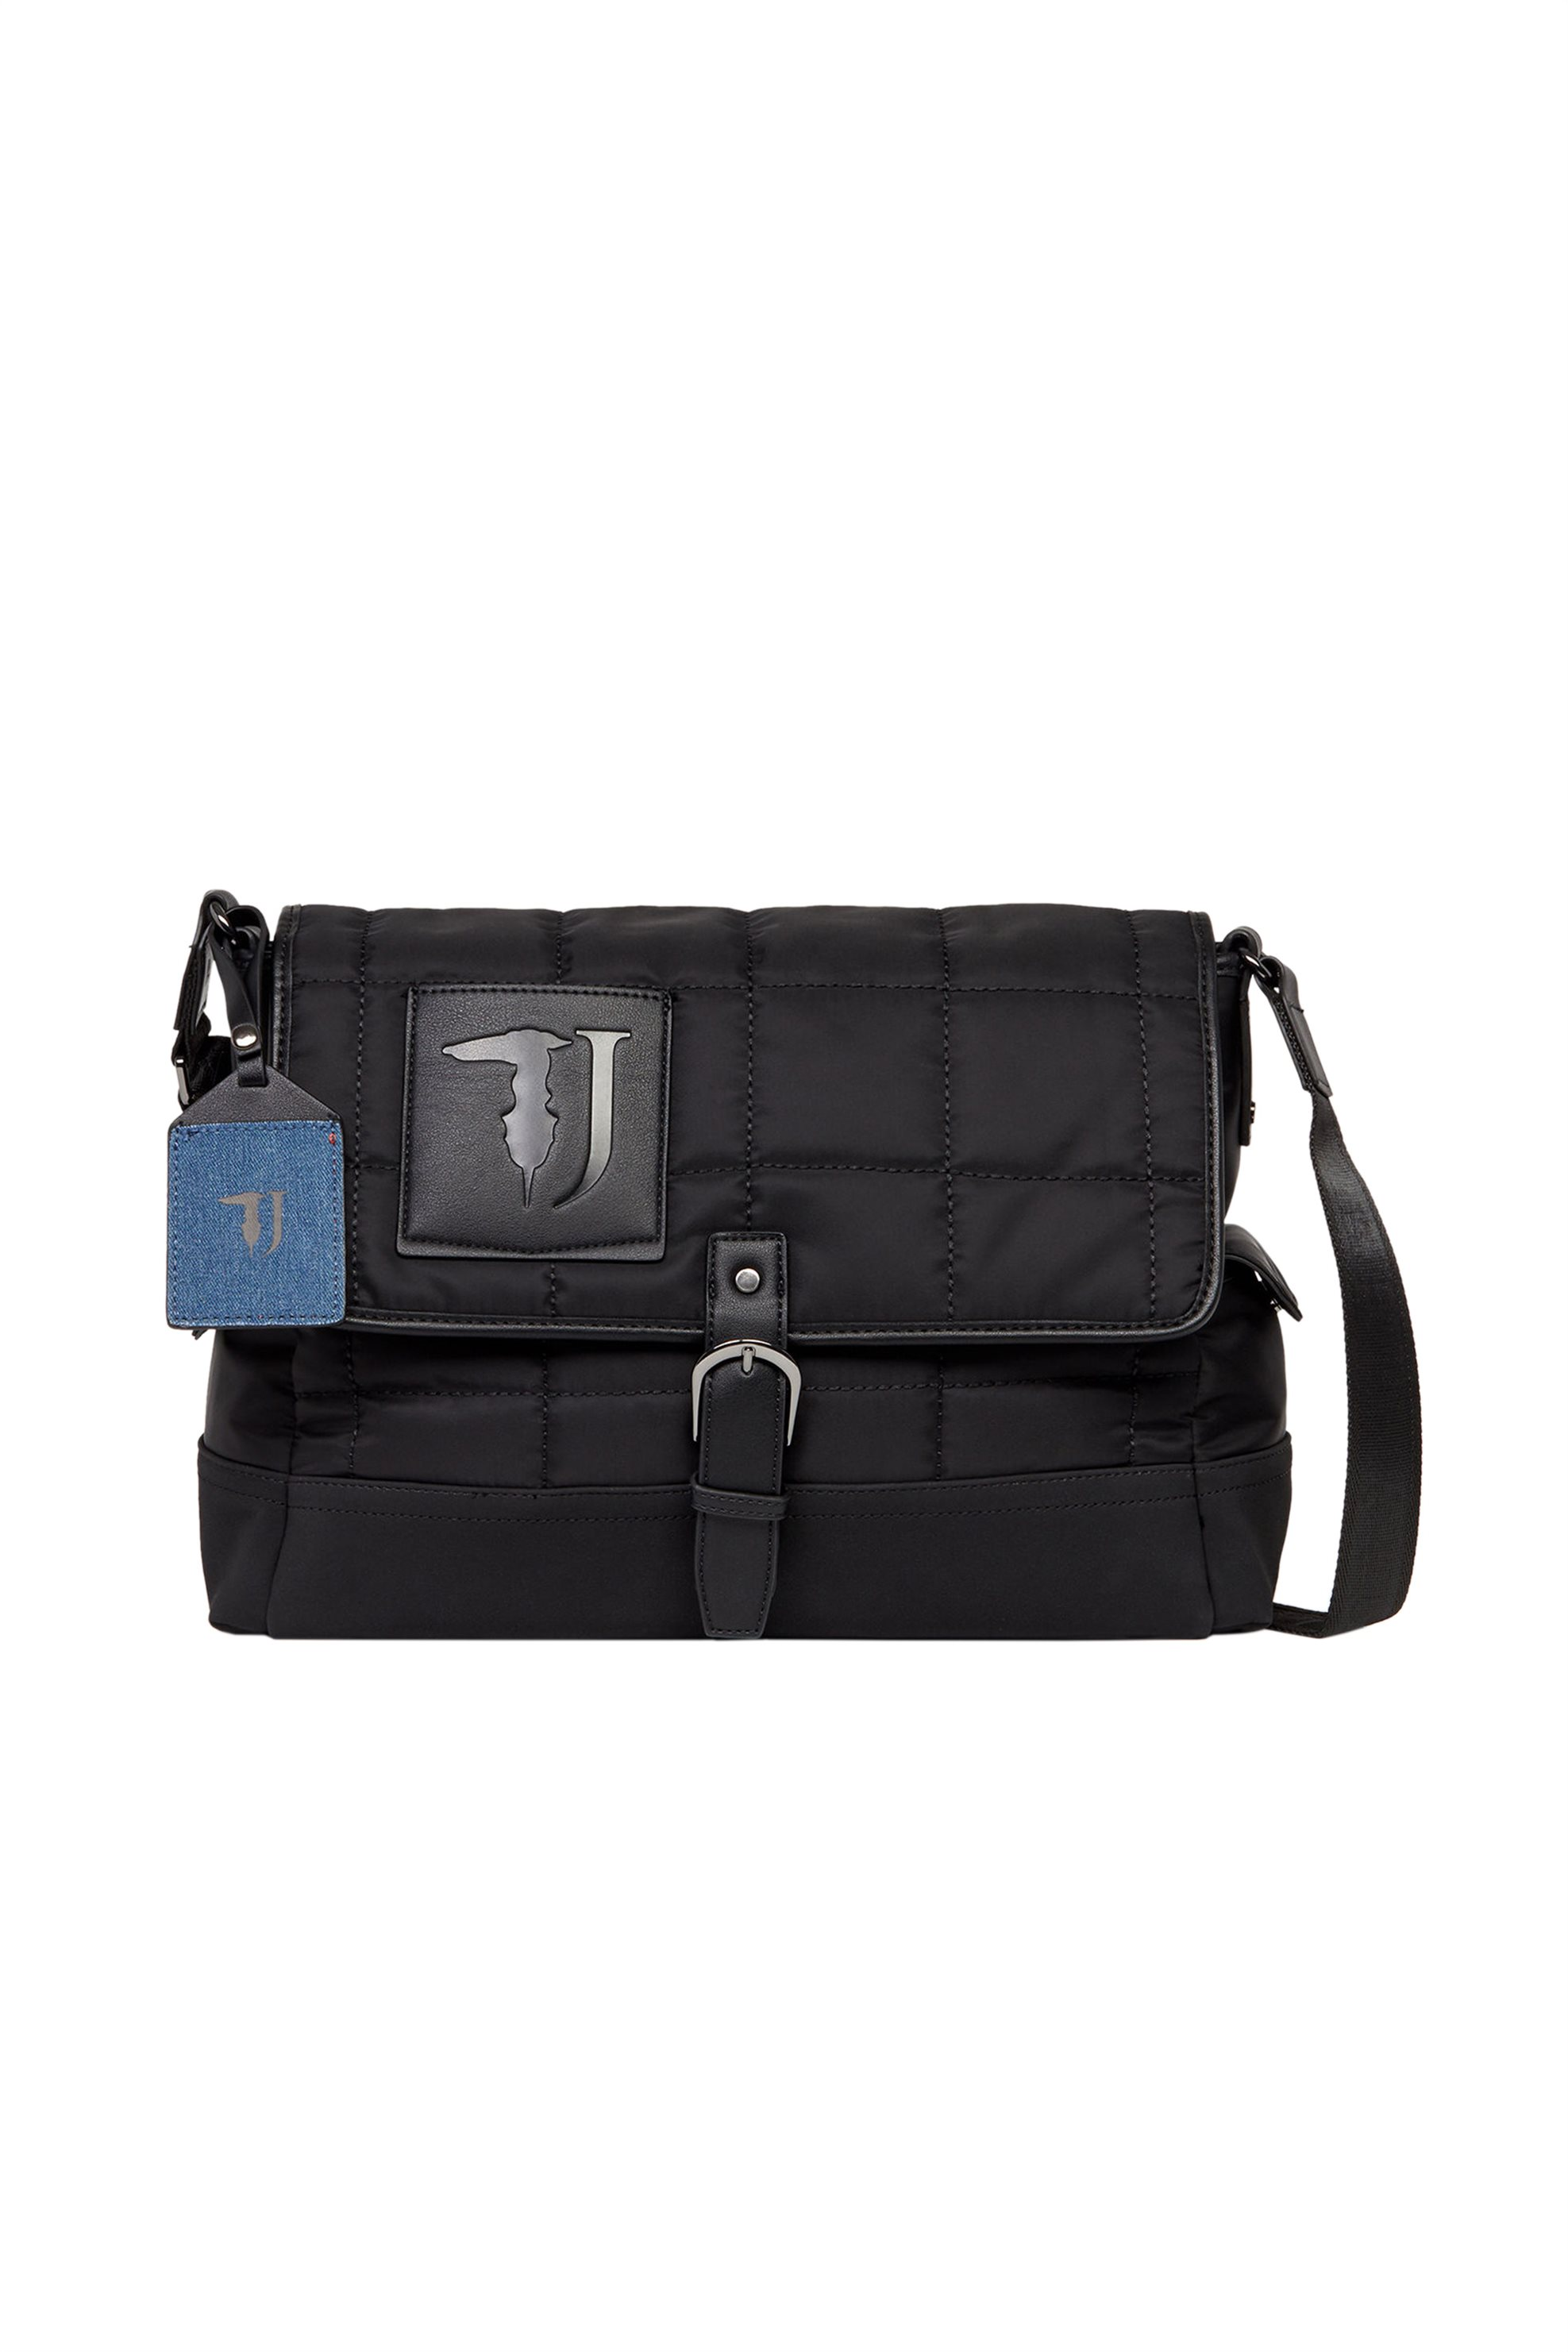 Trussardi Jeans ανδρική καπιτονέ messenger bag Ticinese - 71B00099-9Y099999 - Μα ανδρασ   τσαντεσ   τσάντες χειρός   laptop